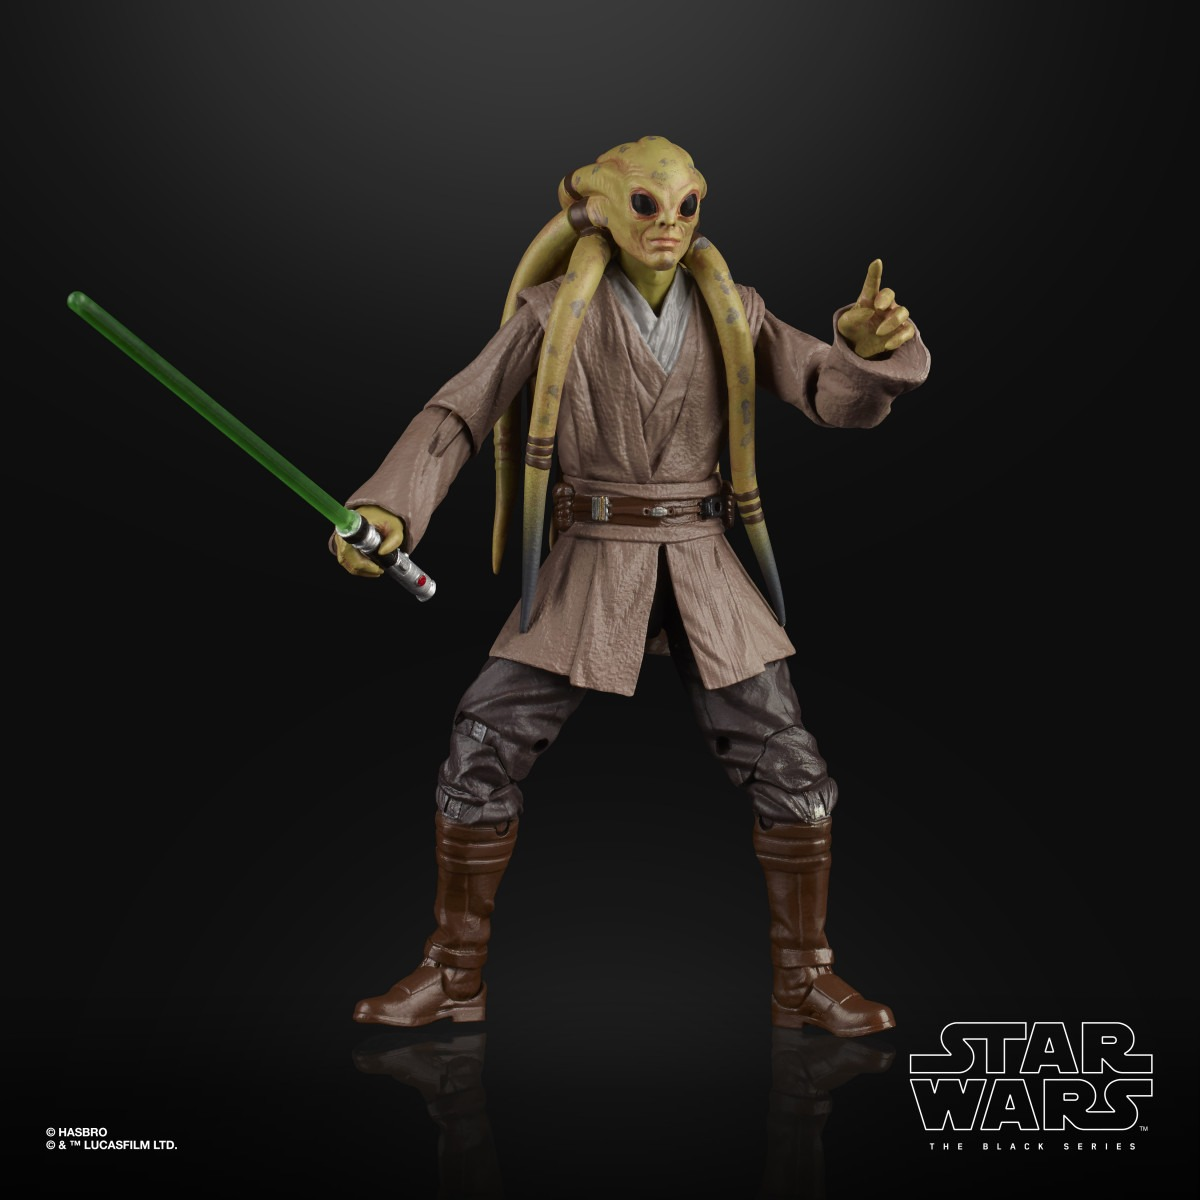 Solo Black Han Figure Series